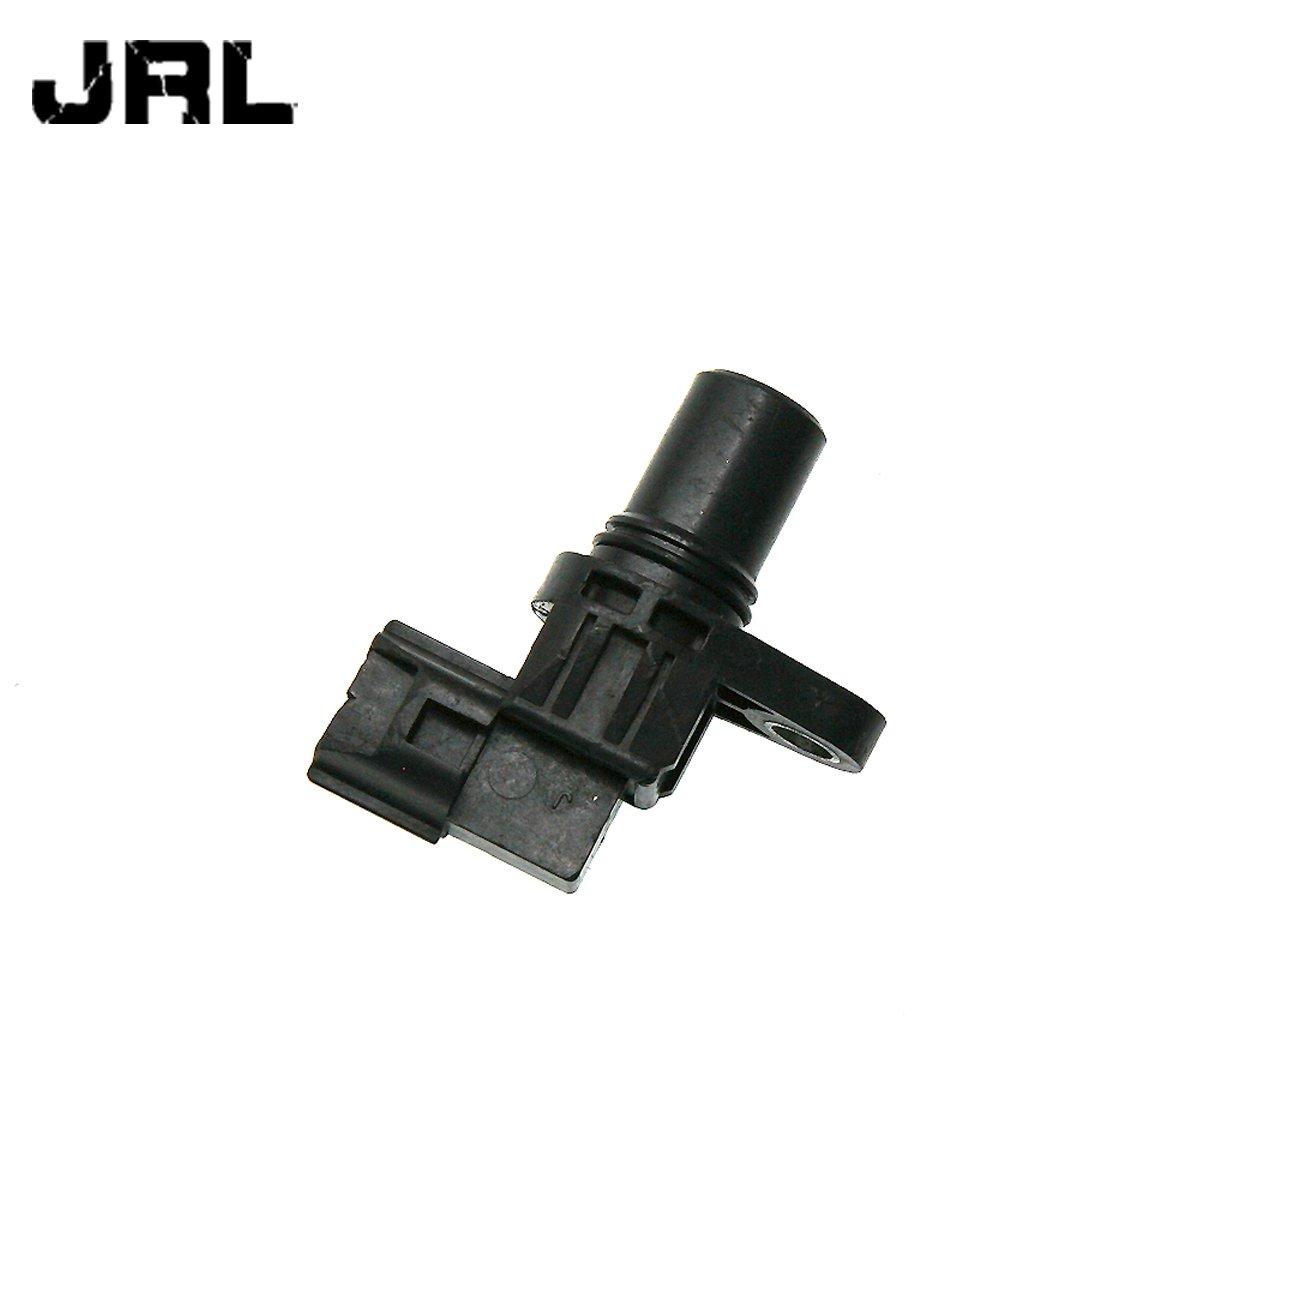 JRL Fuel Pump Speed Sensor For MITSUBISHI PAJERO SHOGUN III 3.2 DI-D ME203180